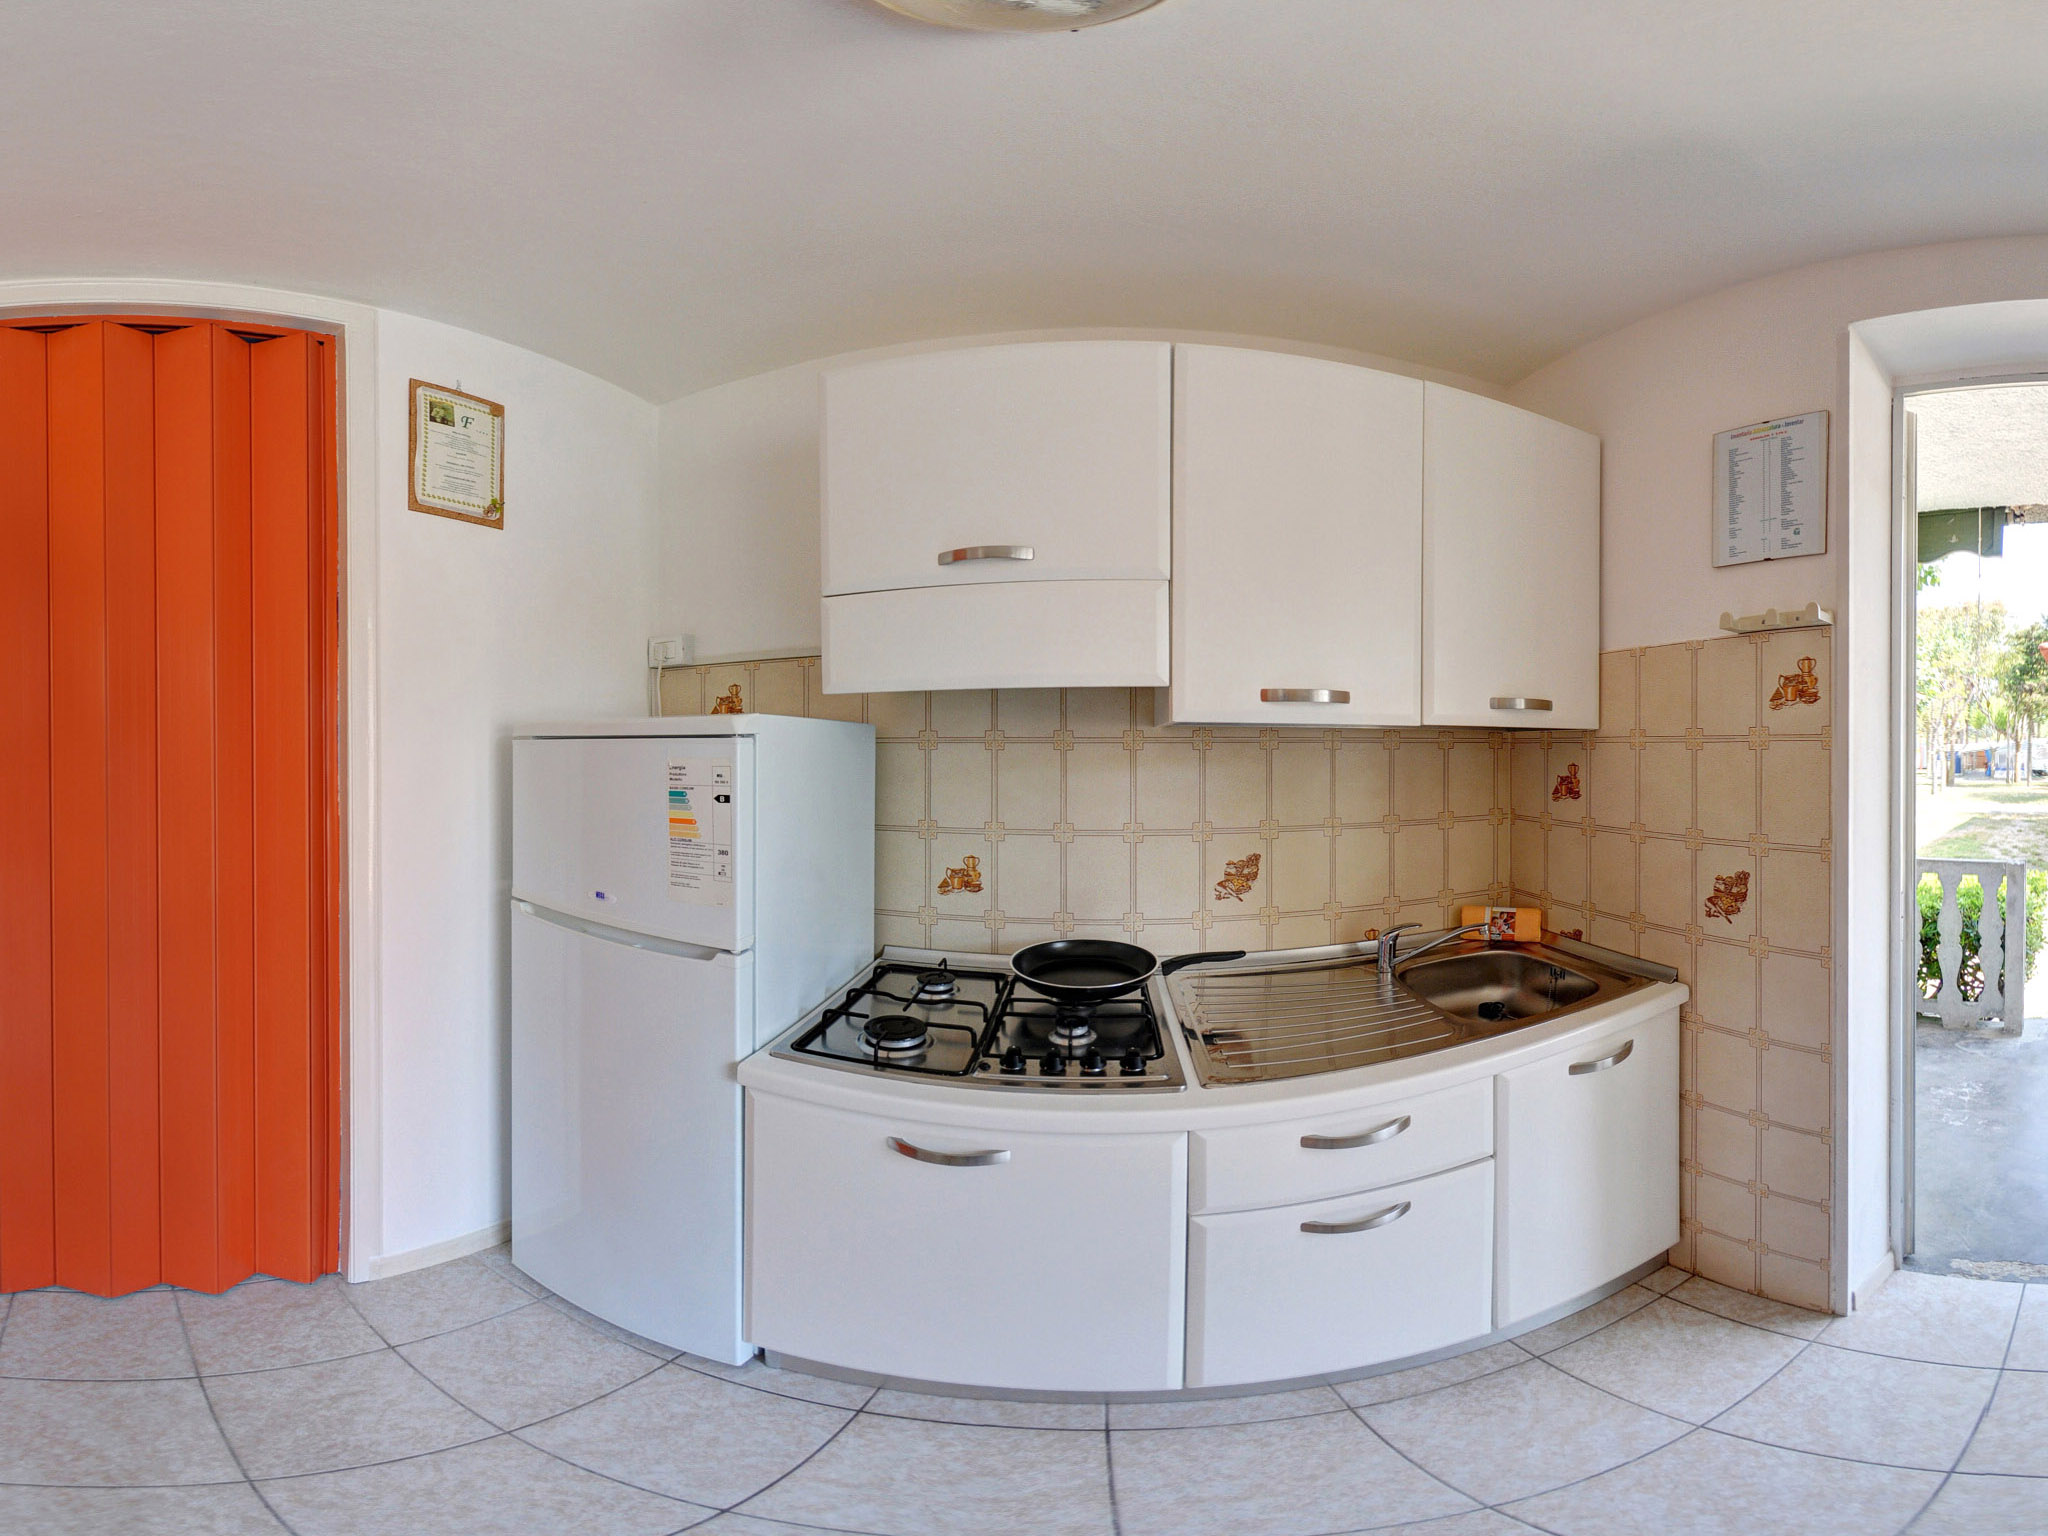 italien bungalow abruzzen am meer eurcamping. Black Bedroom Furniture Sets. Home Design Ideas